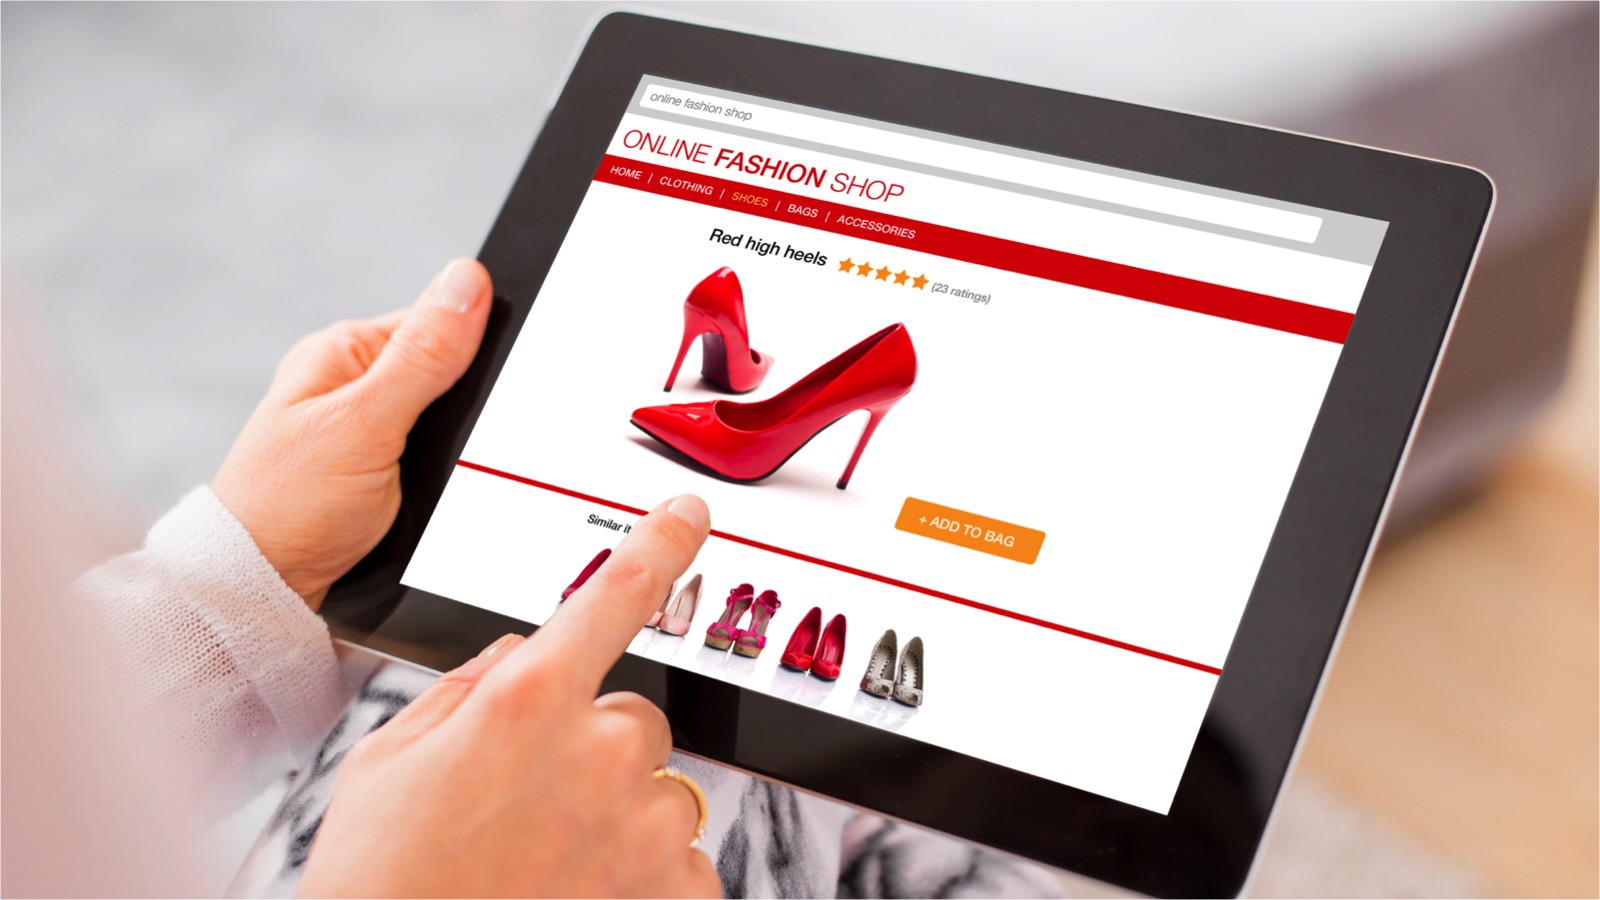 ECサイトがInstagramショッピング機能で売上アップさせる方法と成功事例を解説